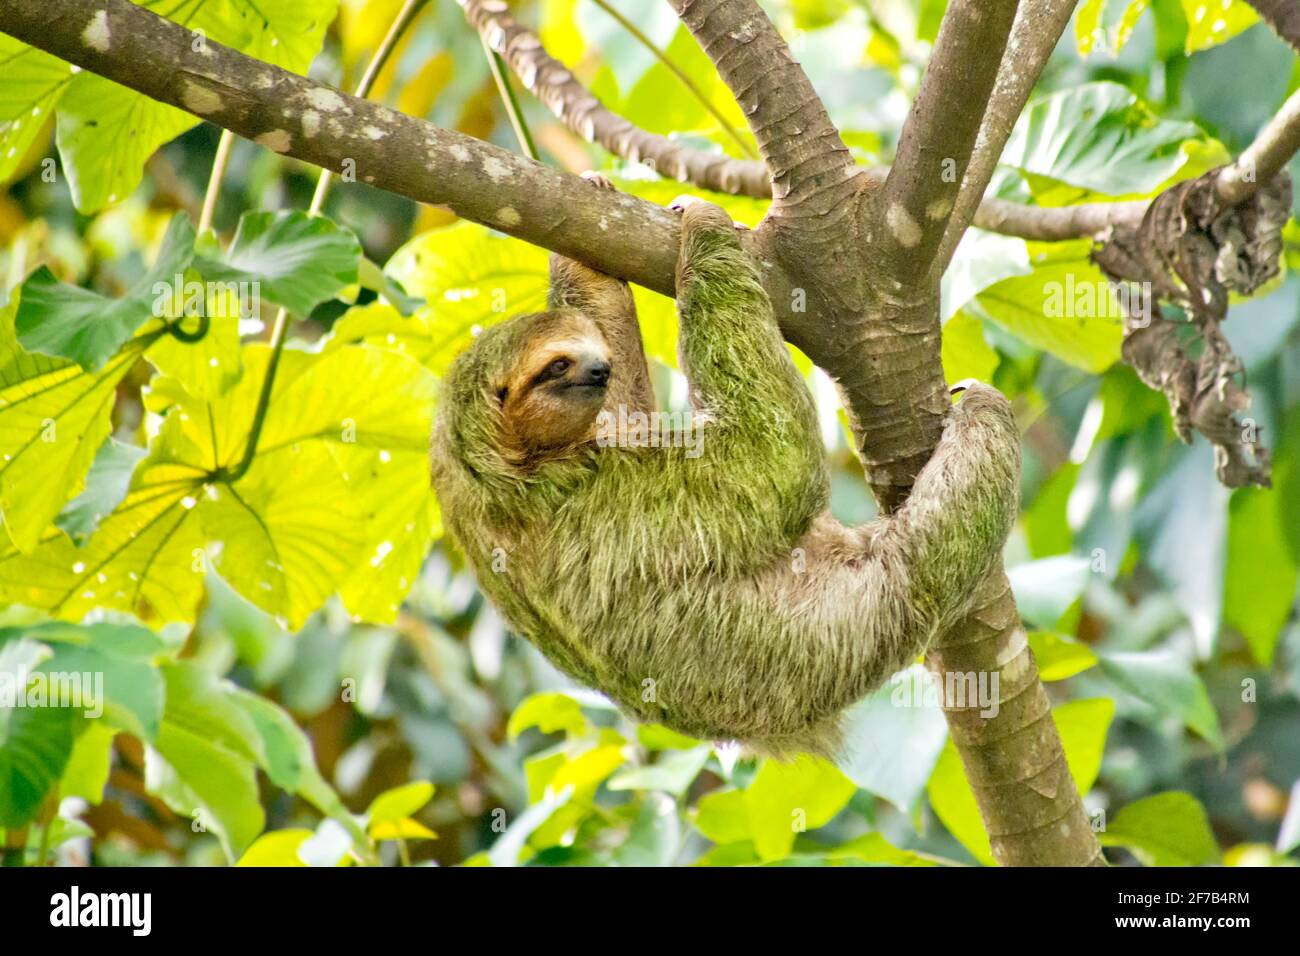 Pale-throated Sloth, Bradypus tridactylus, Three-toed Sloth, Tropical Rainforest, Marino Ballena National Park, Uvita de Osa, Puntarenas, Costa Rica, Stock Photo